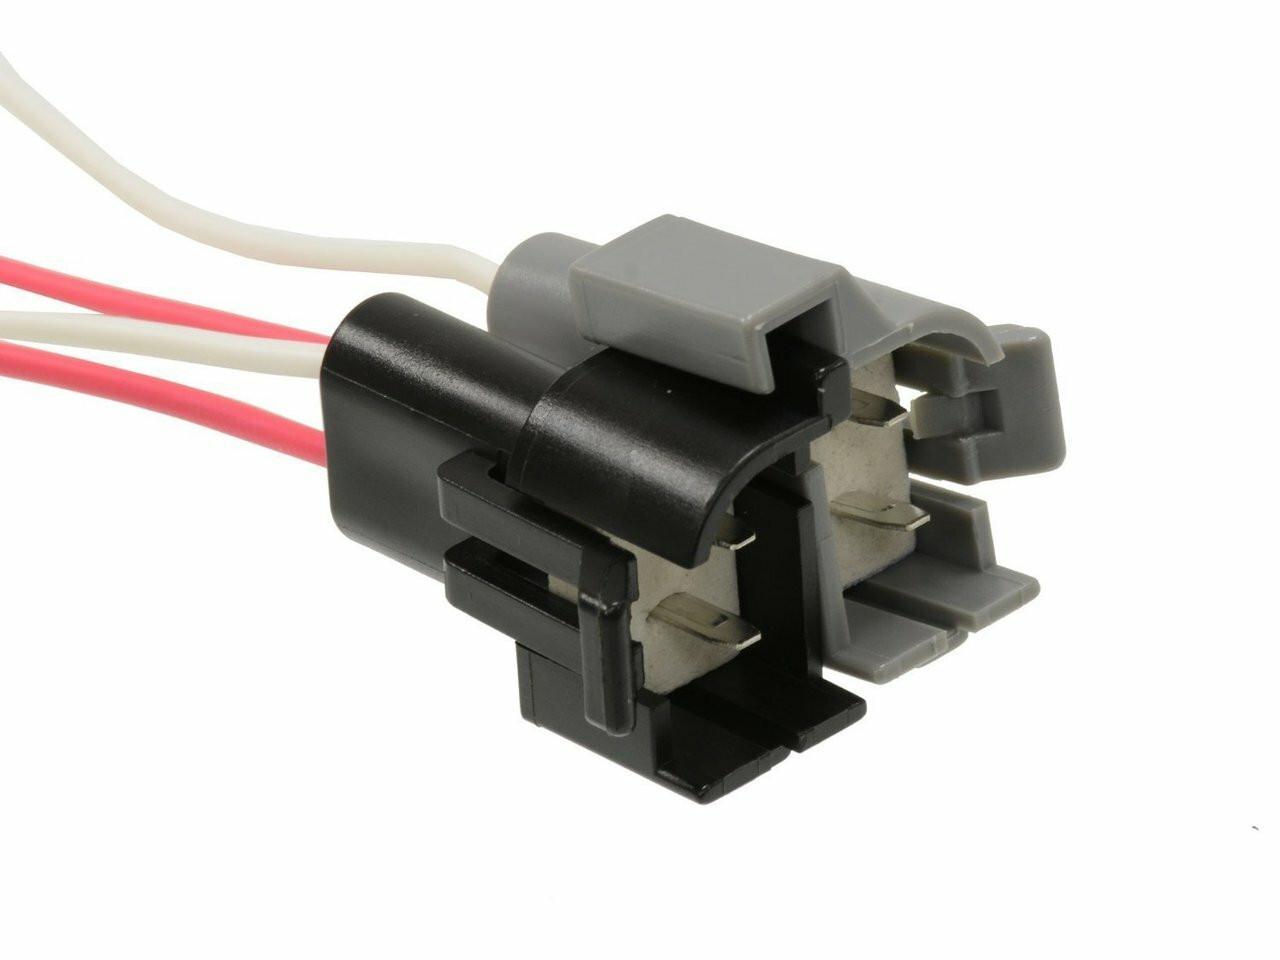 medium resolution of michgian motorsports lt1 ignition coil wire harness set tpi tbi connector fits gm camaro firebird